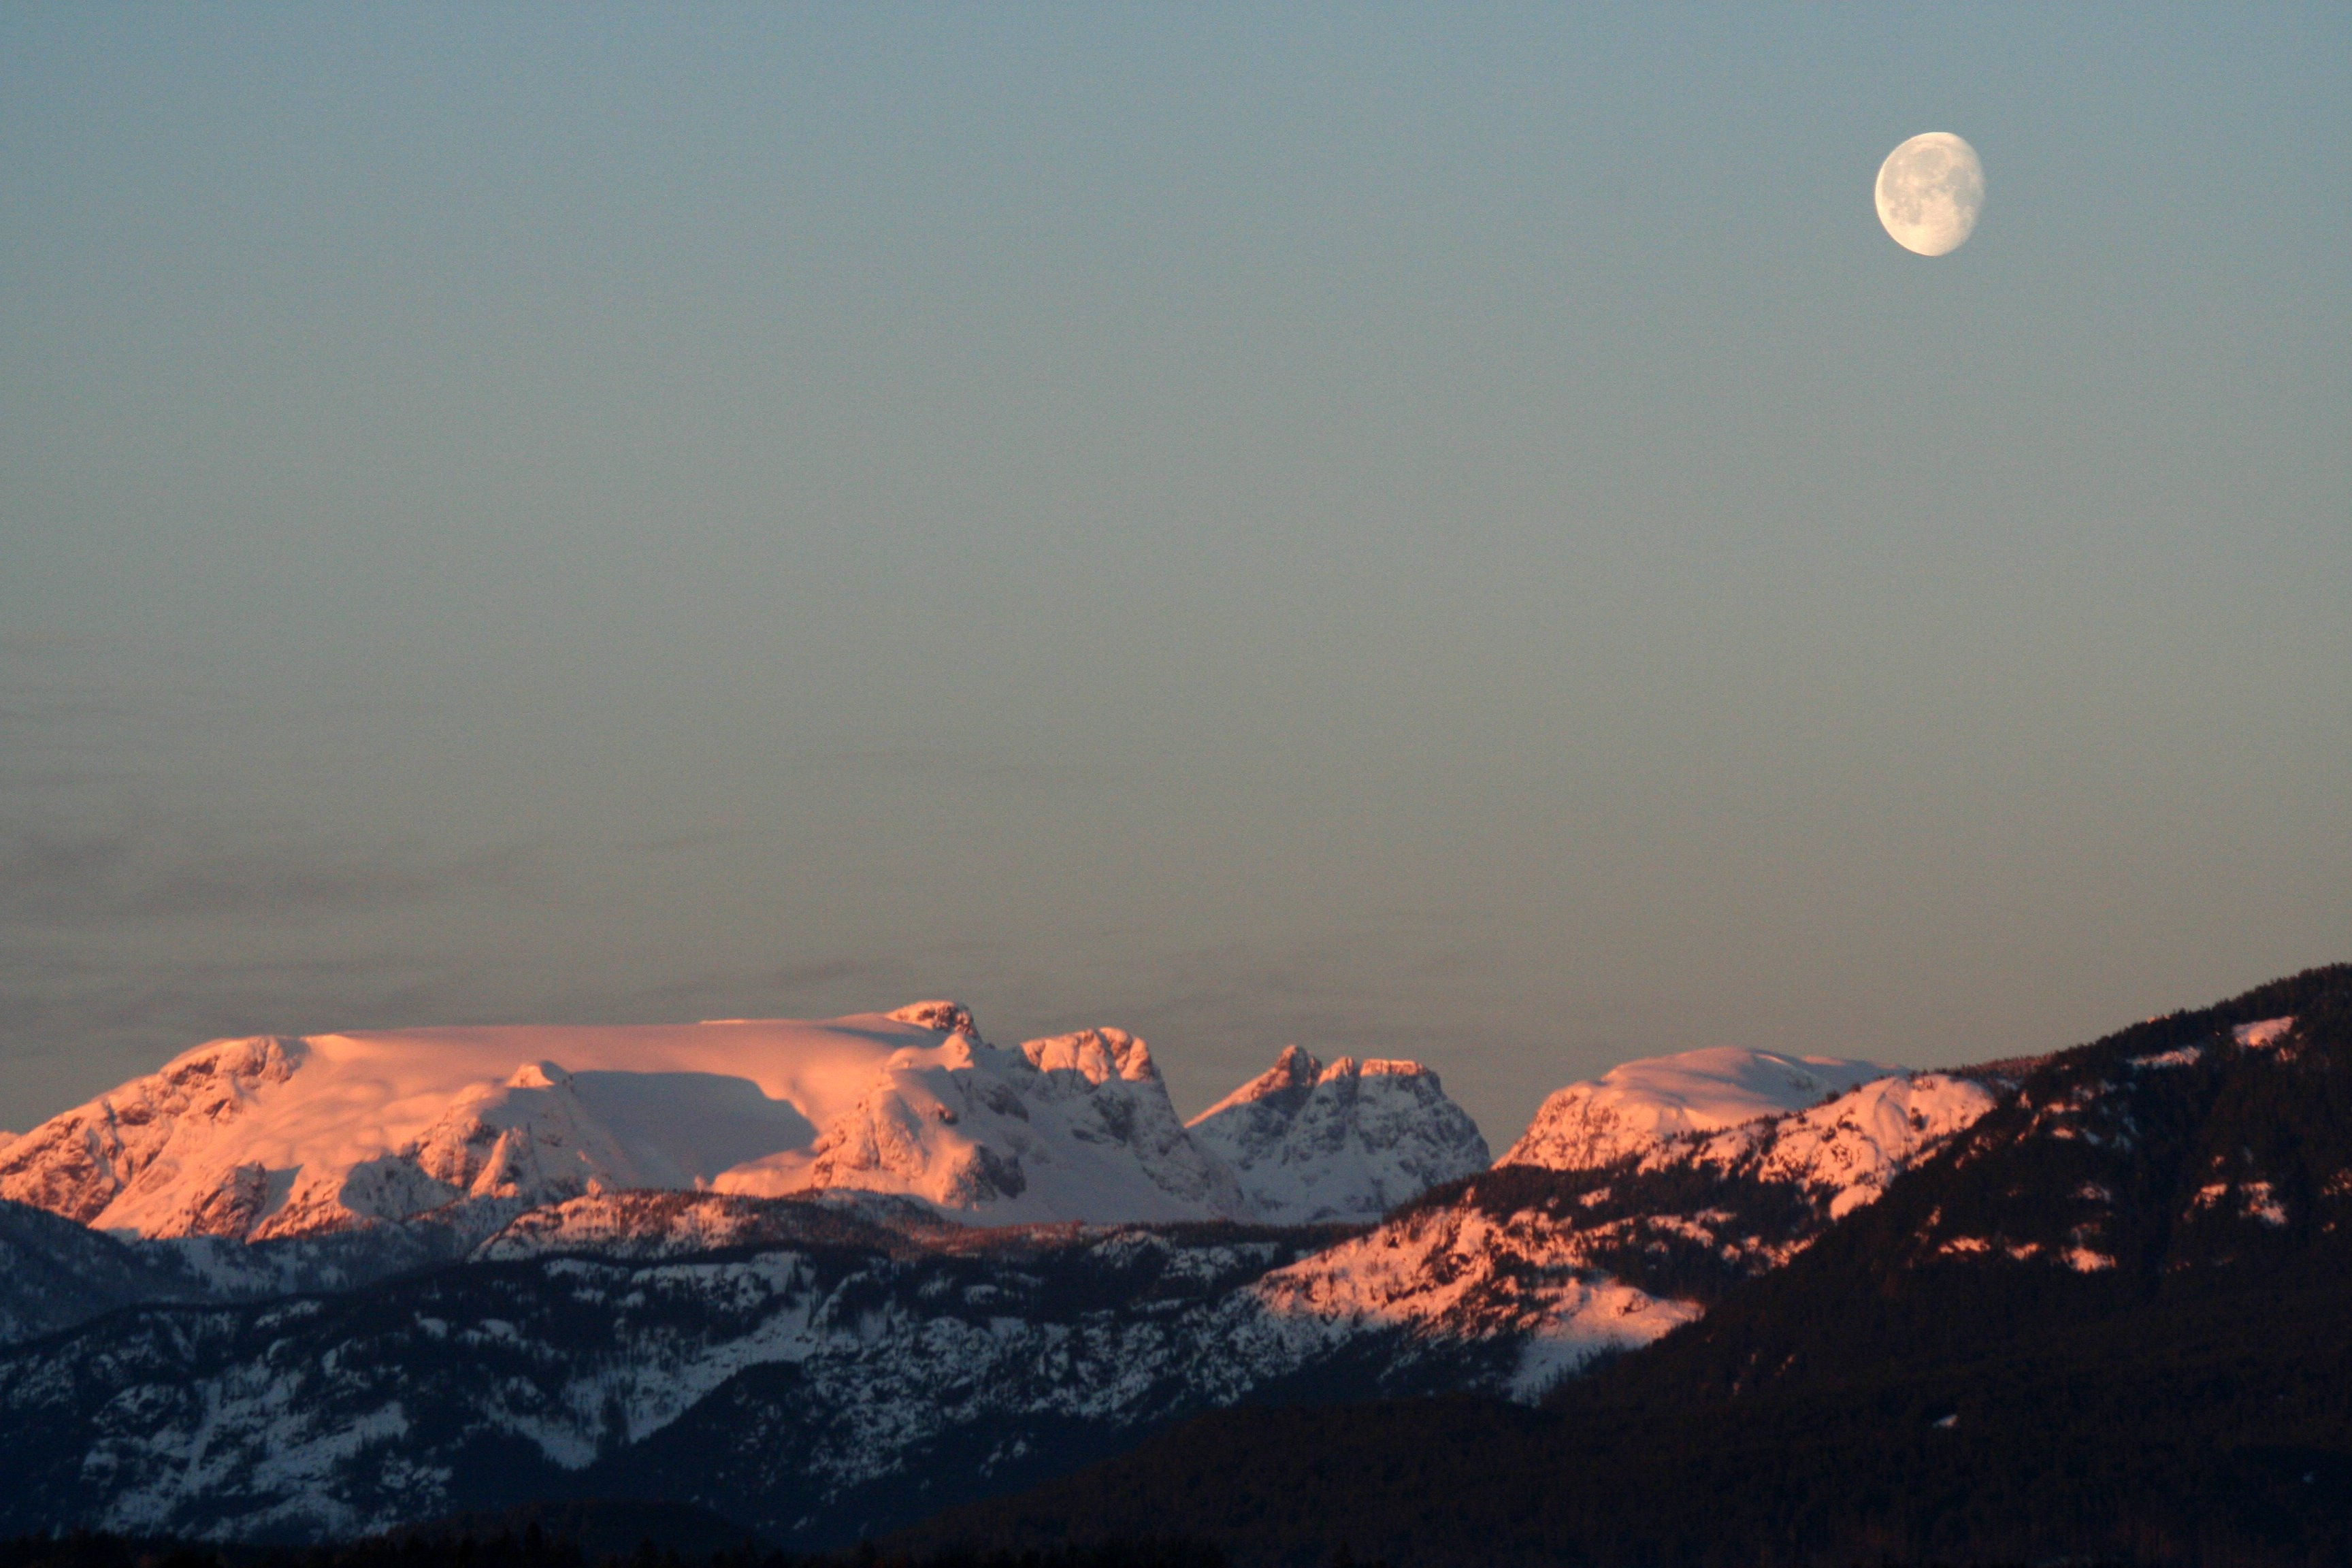 https://upload.wikimedia.org/wikipedia/commons/6/66/Comox_Glacier_on_a_February_Morning.jpg